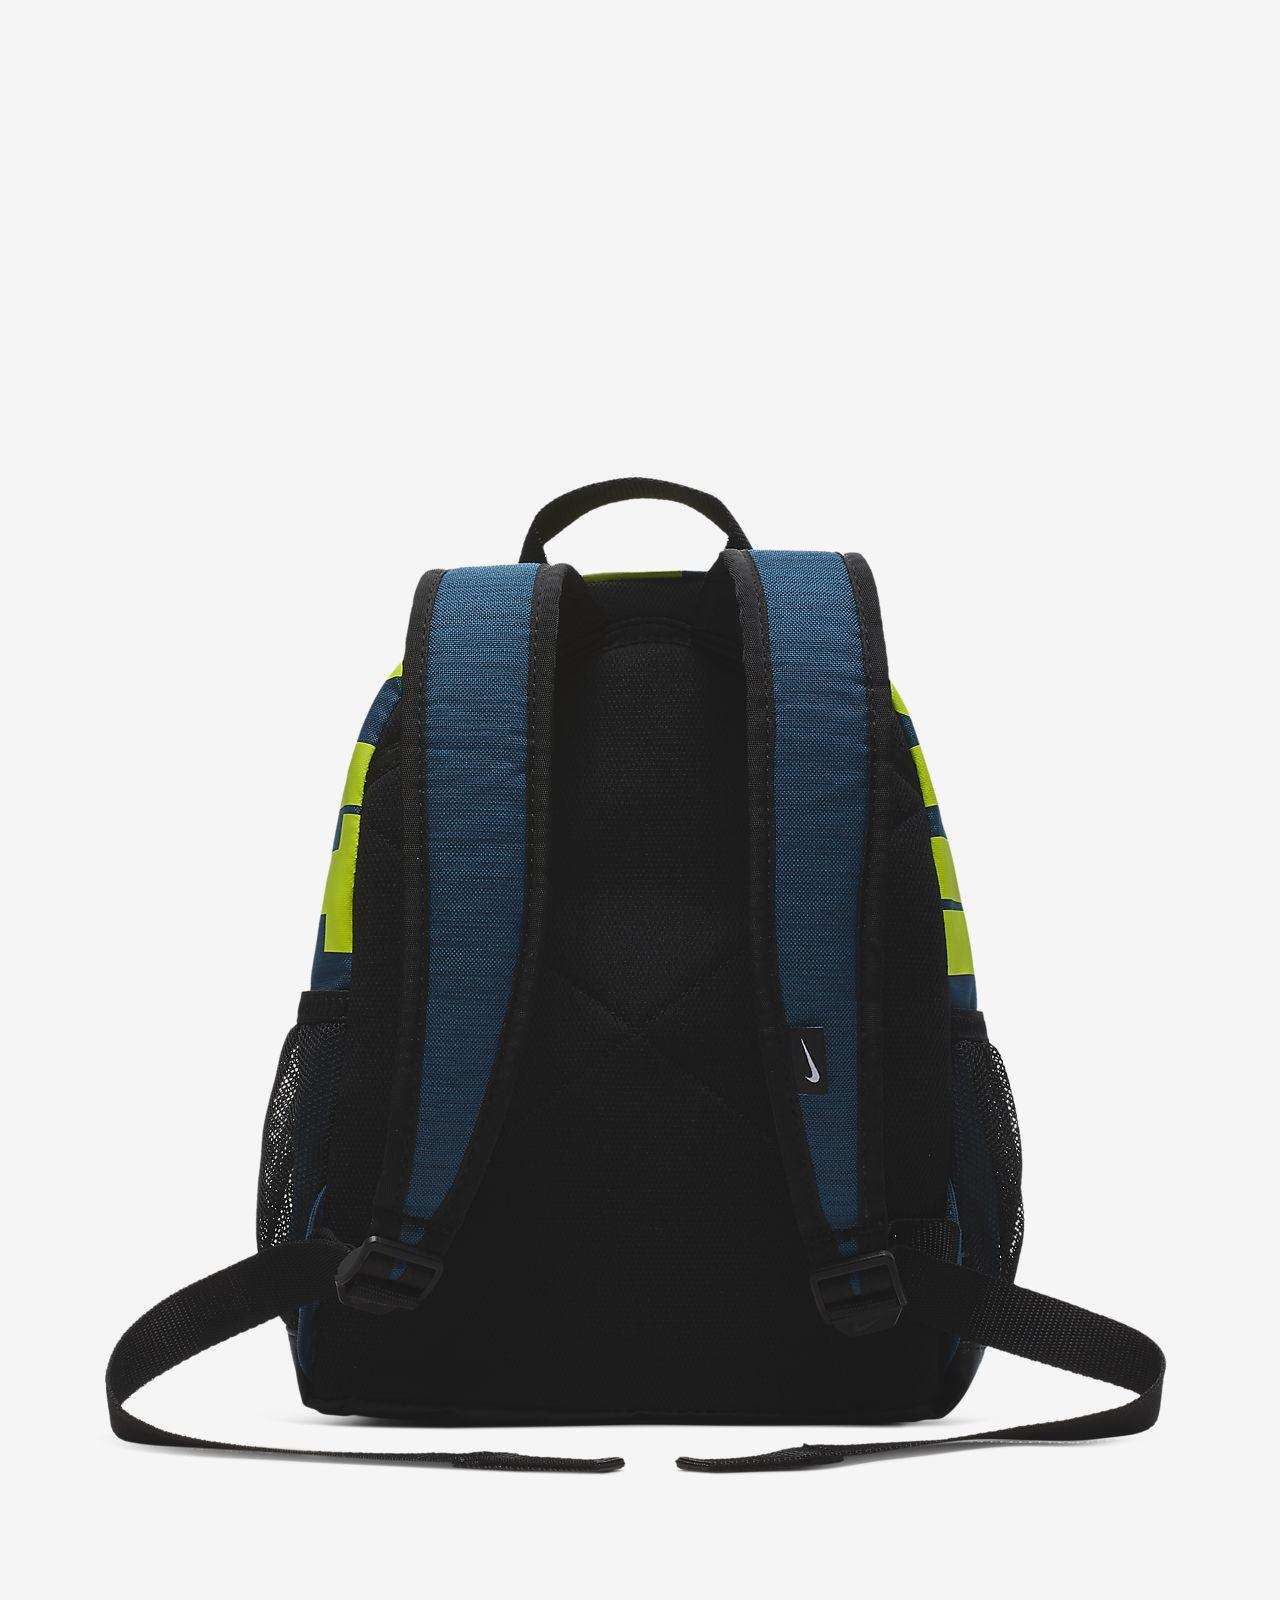 7ce795348a Nike Brasilia Just Do It Kids  Backpack (Mini). Nike.com GB